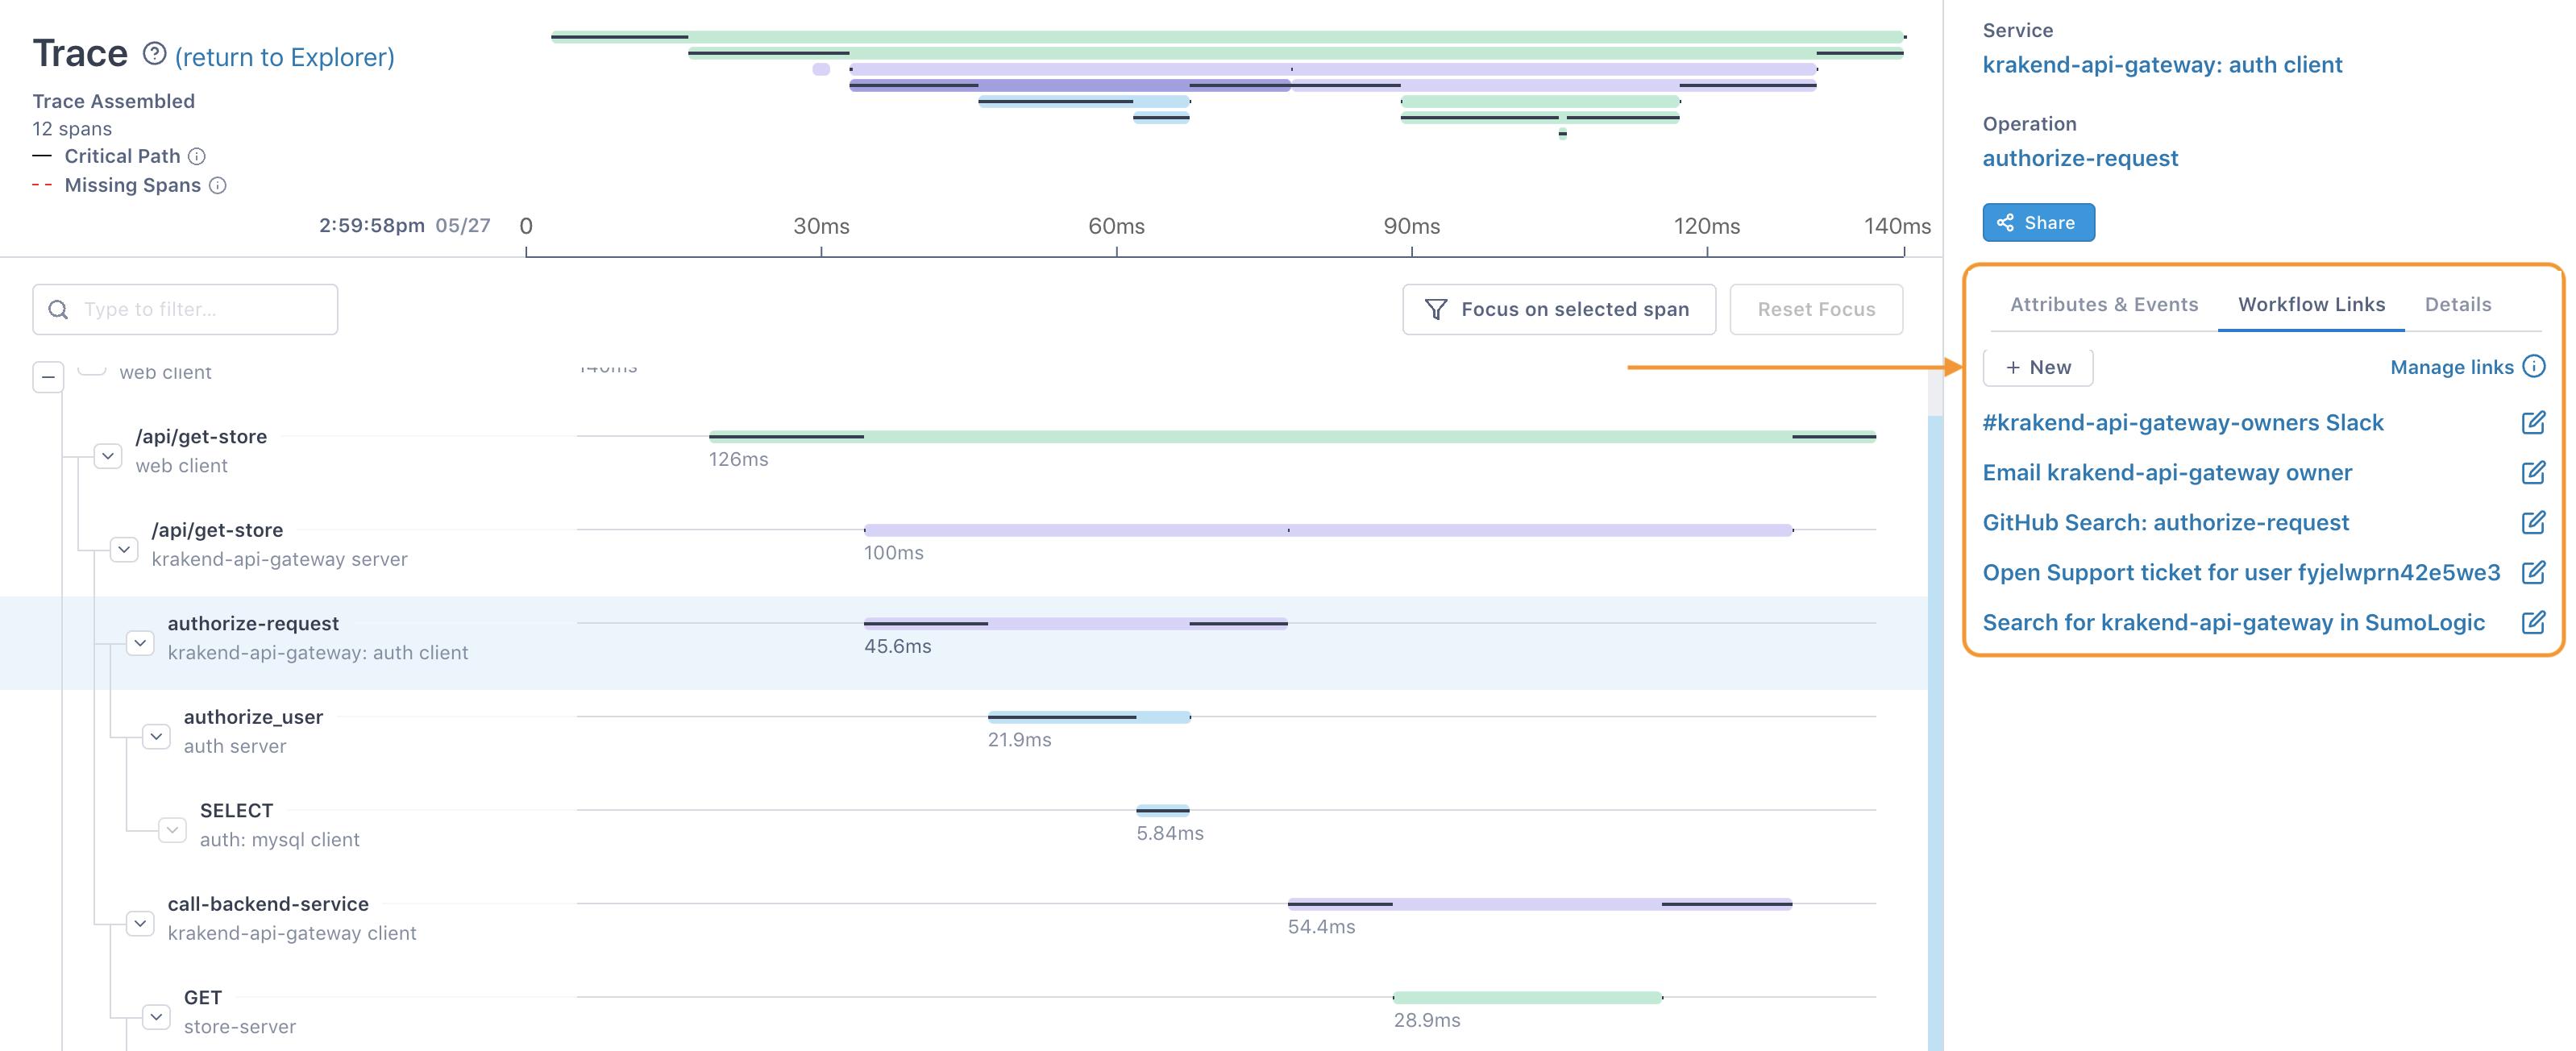 Workflow links